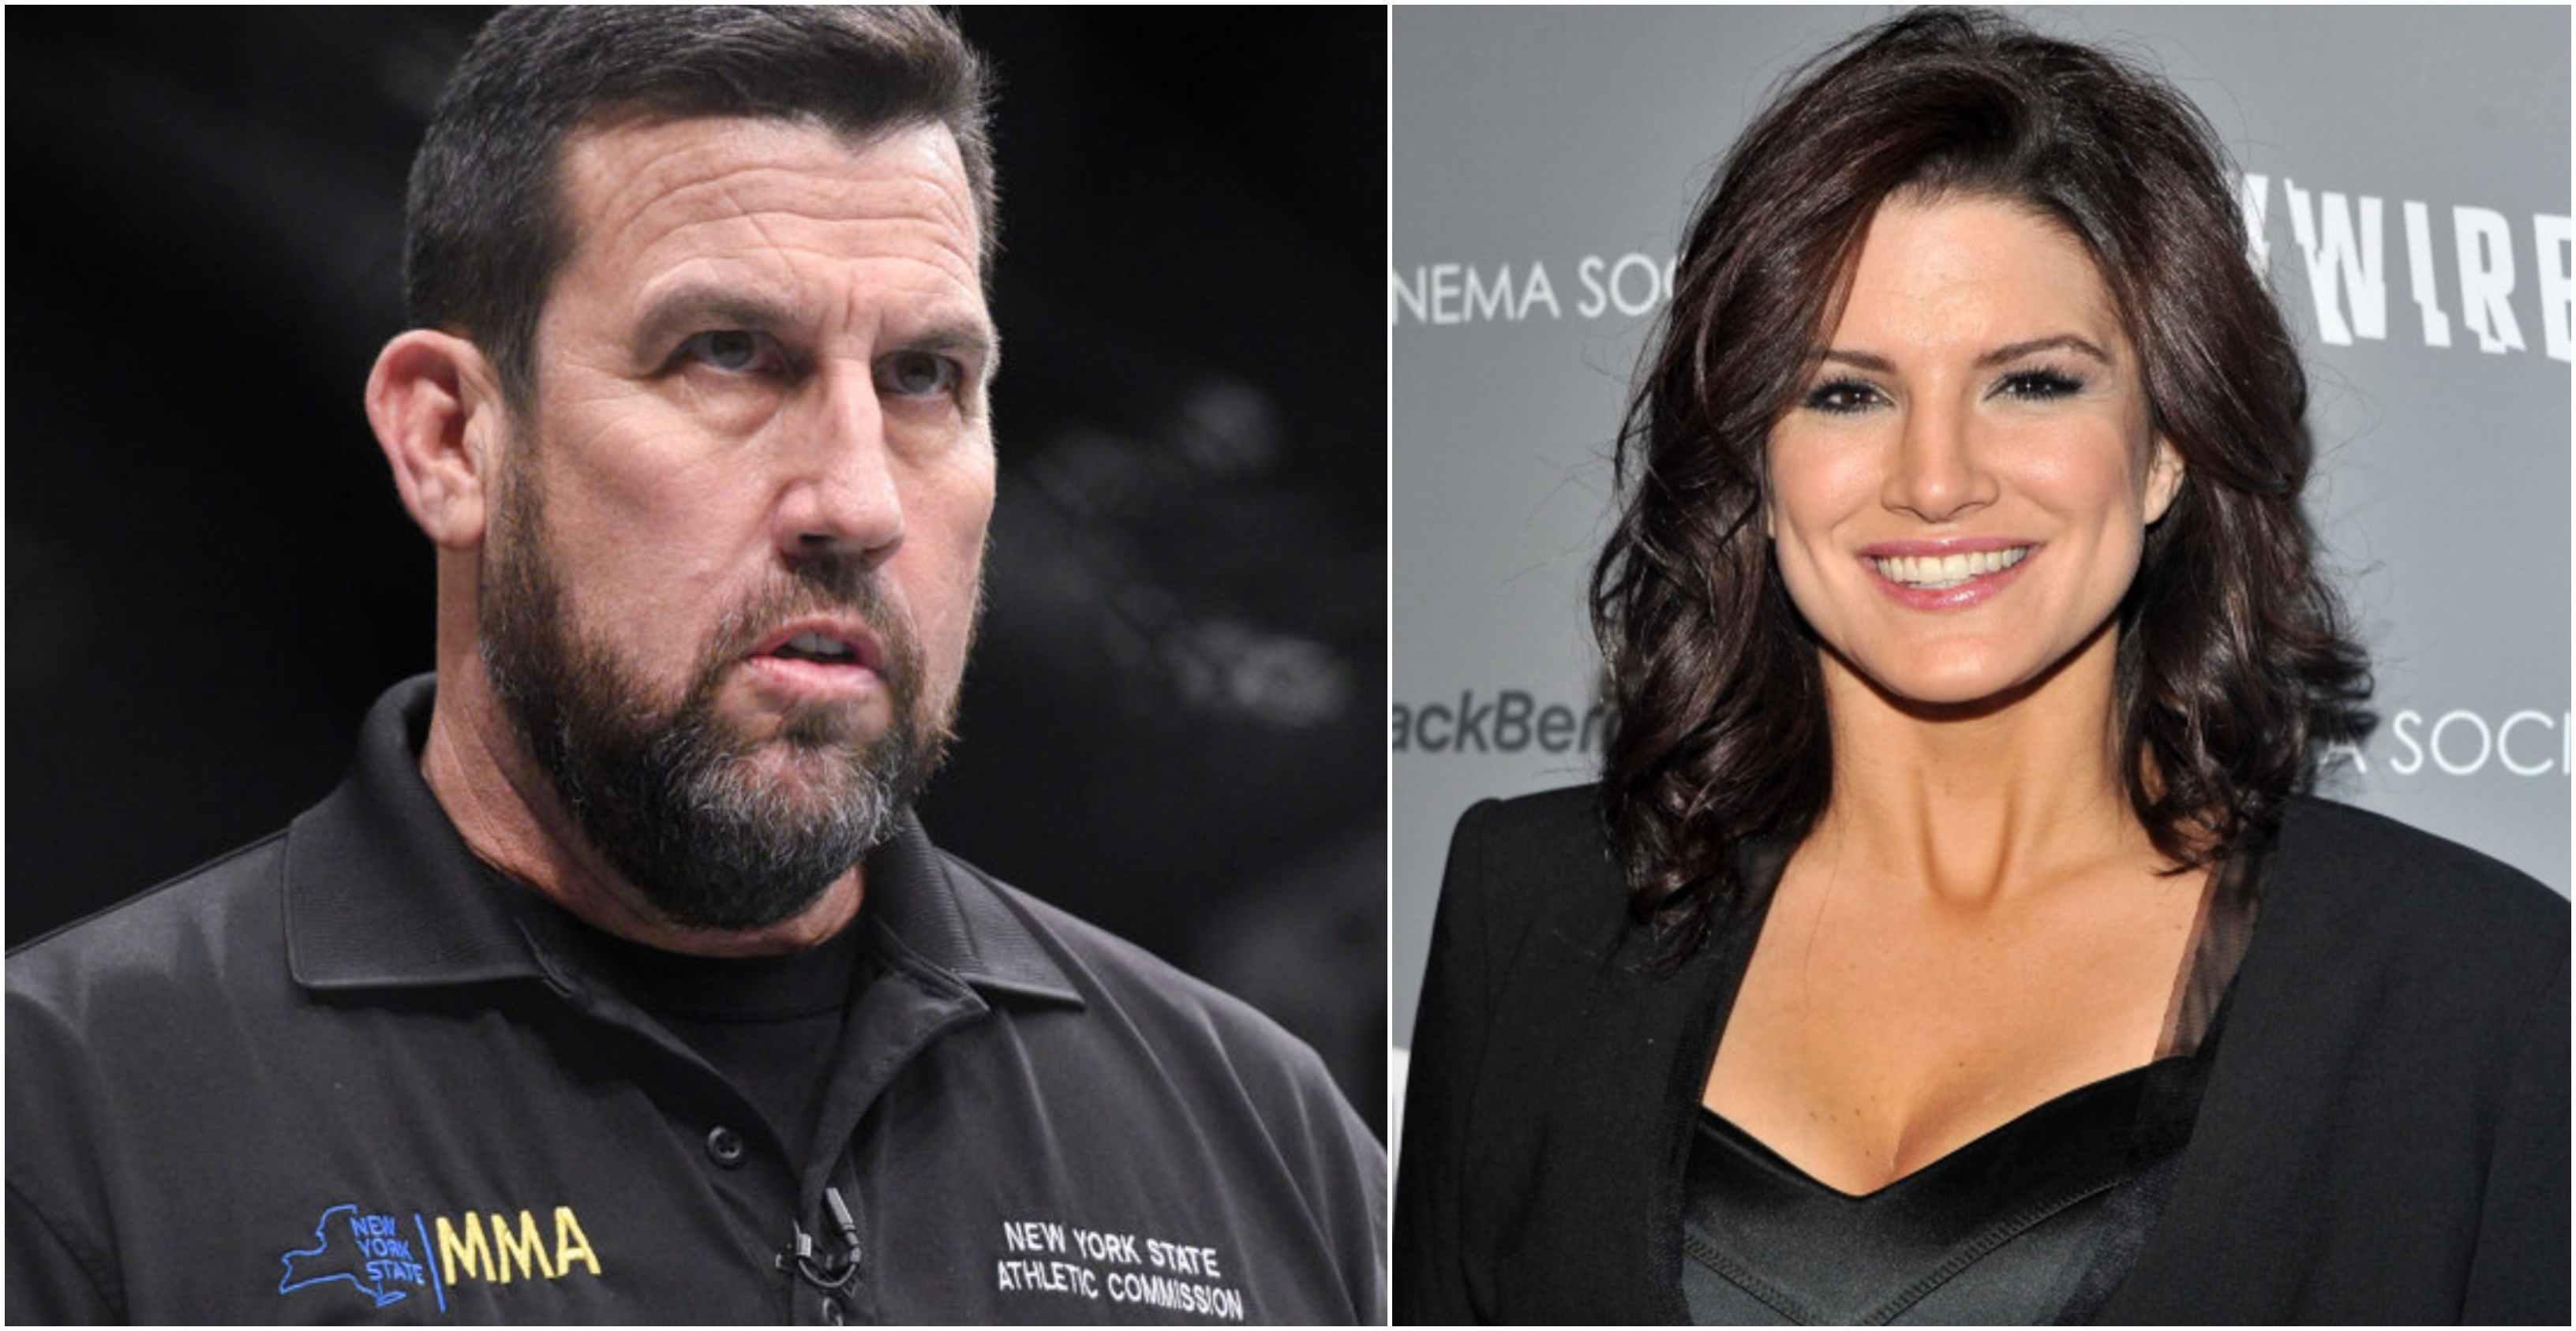 Big John McCarthy defends Gina Carano, says she didn't deserve abuse from Dana White - Gina